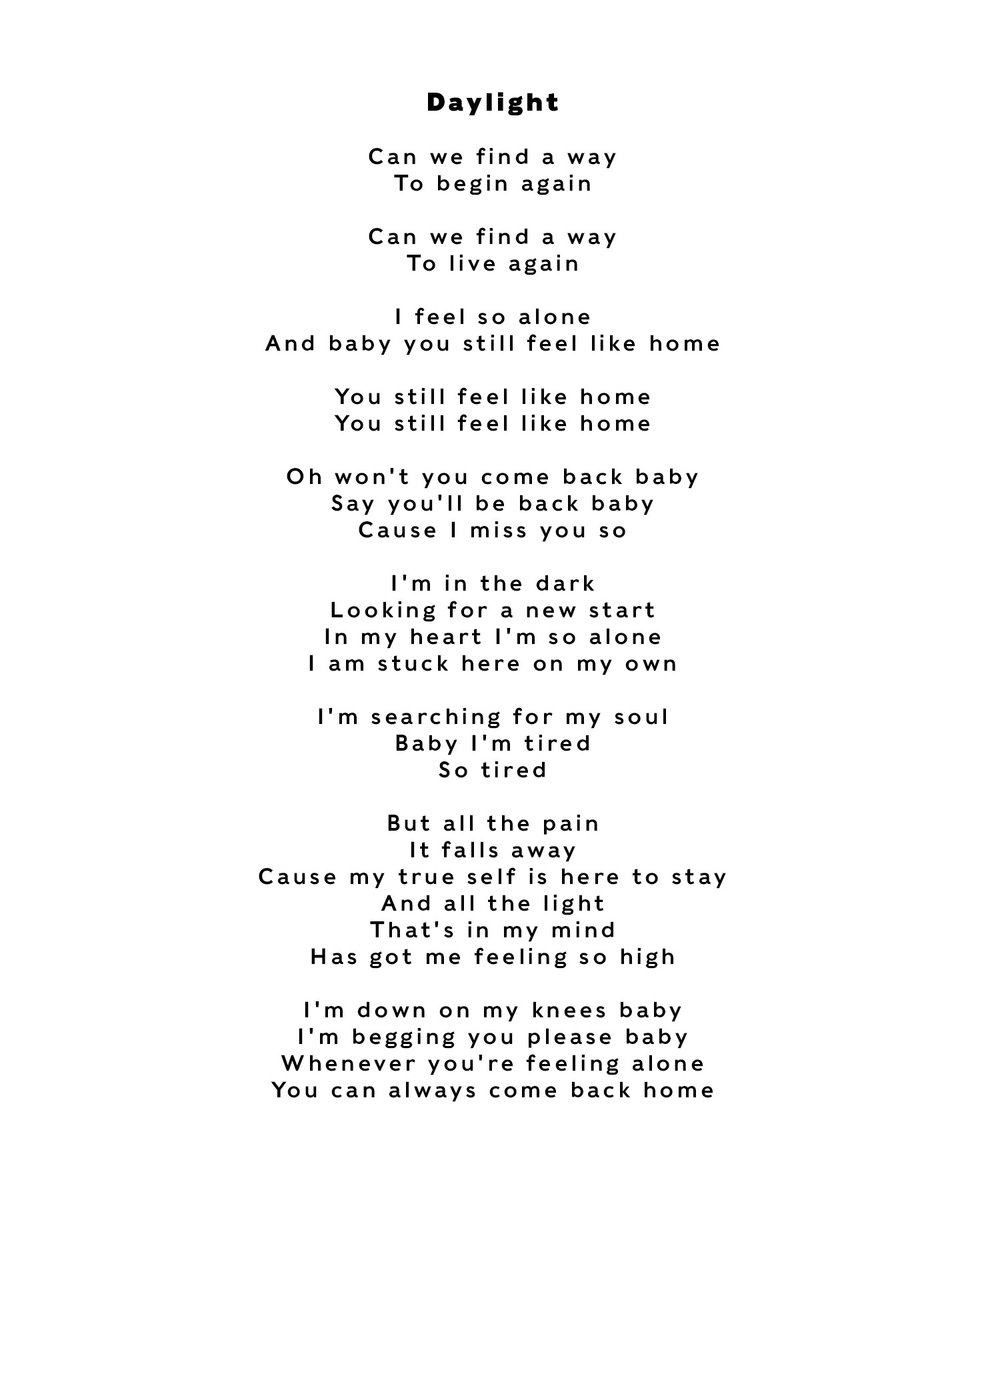 Daylight Lyrics.jpg